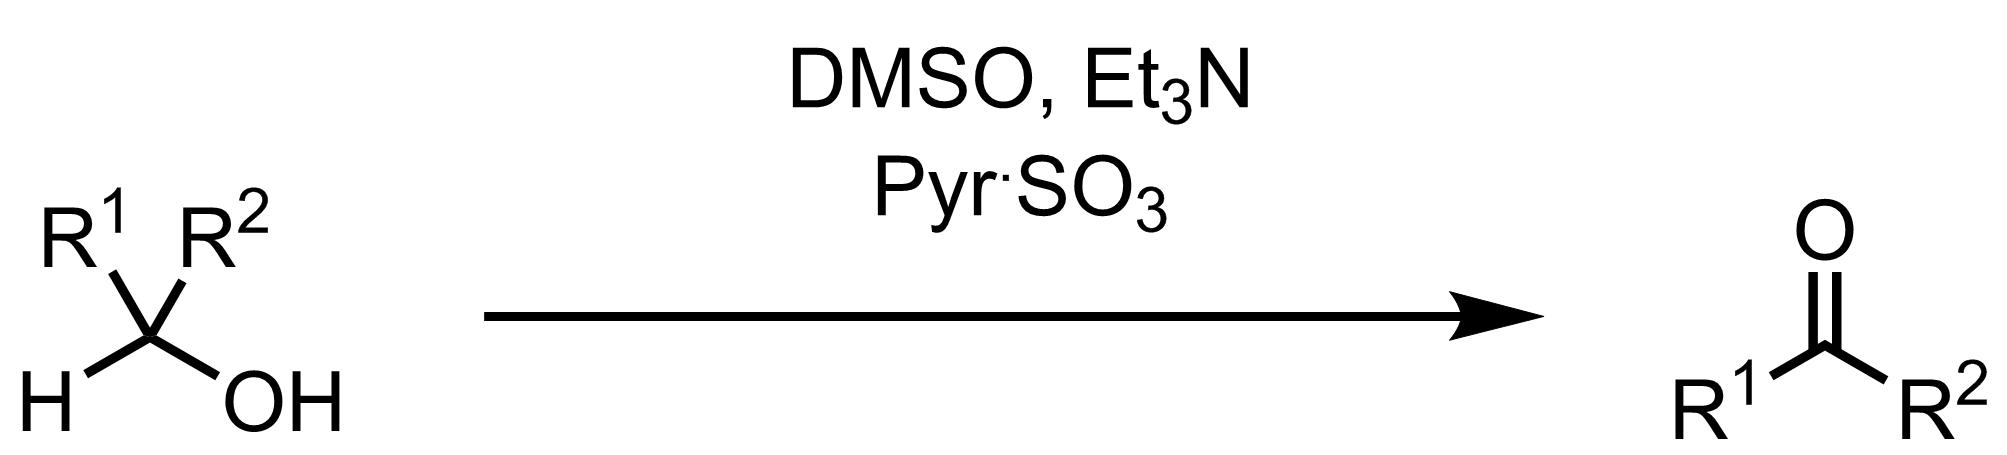 Schematic representation of the Parikh-Doering Oxidation.